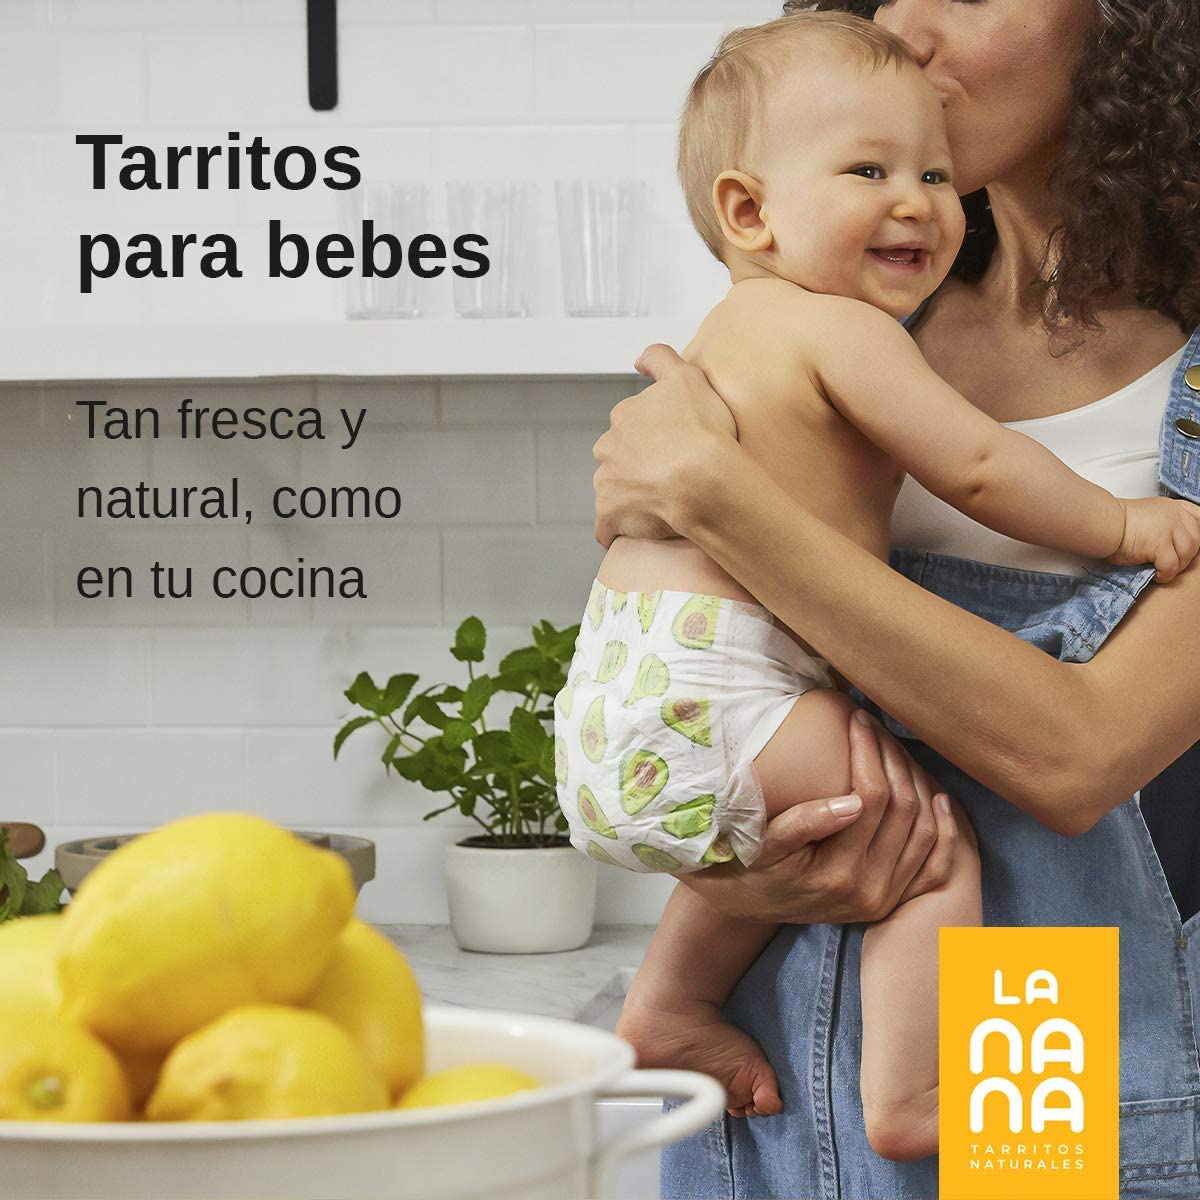 Pack de 6 tarritos ecol/ógicos para bebes de fruta y verdura de 190 g LANANA